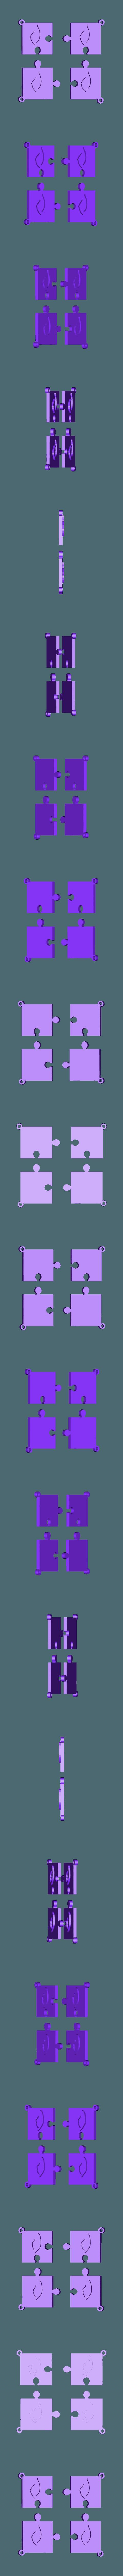 puzzle v.stl Download STL file puzzle key ring • 3D printing design, catf3d